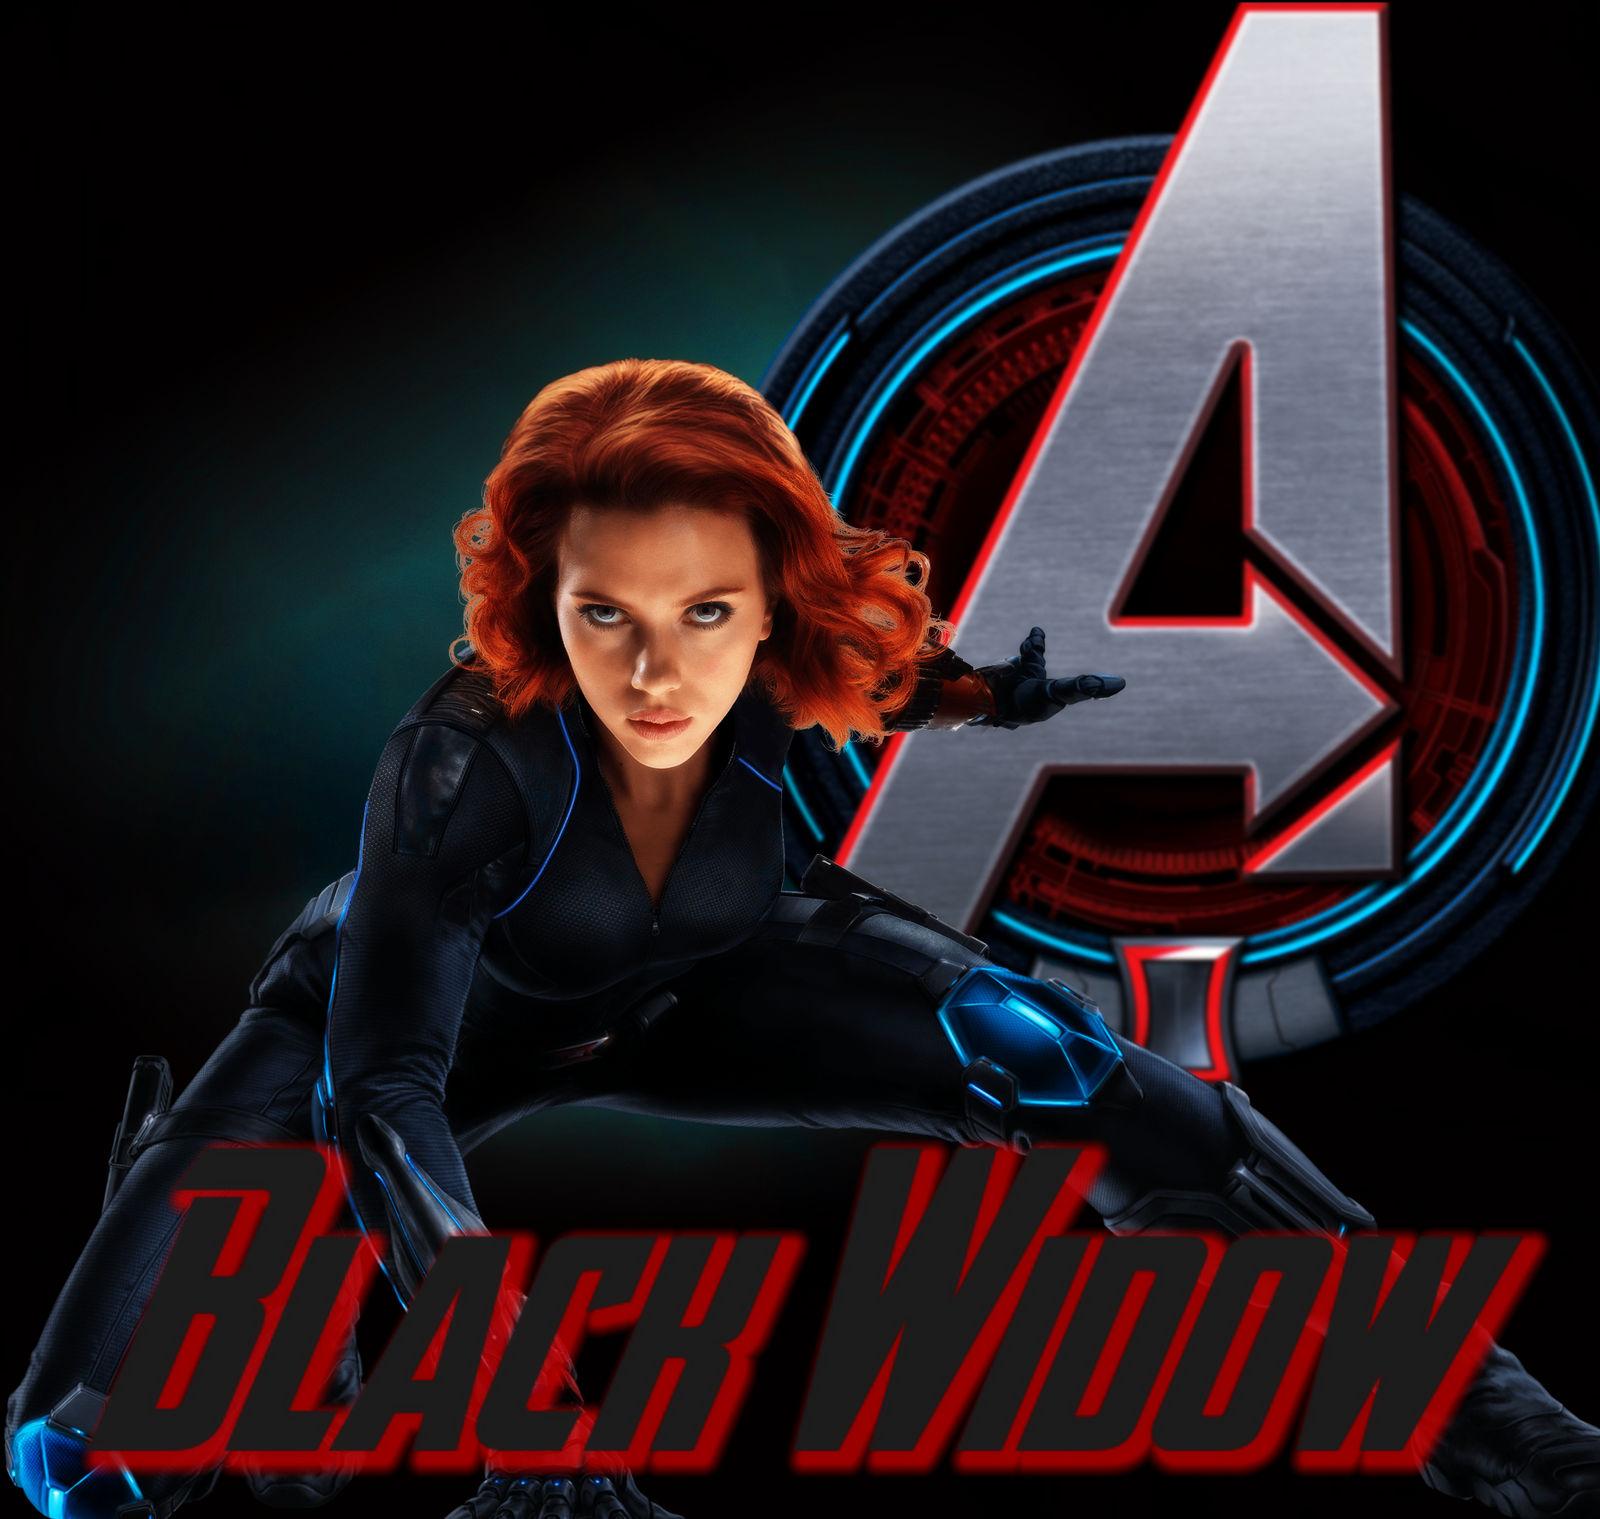 Black Widow wallpaper by ArkhamNatic on DeviantArt